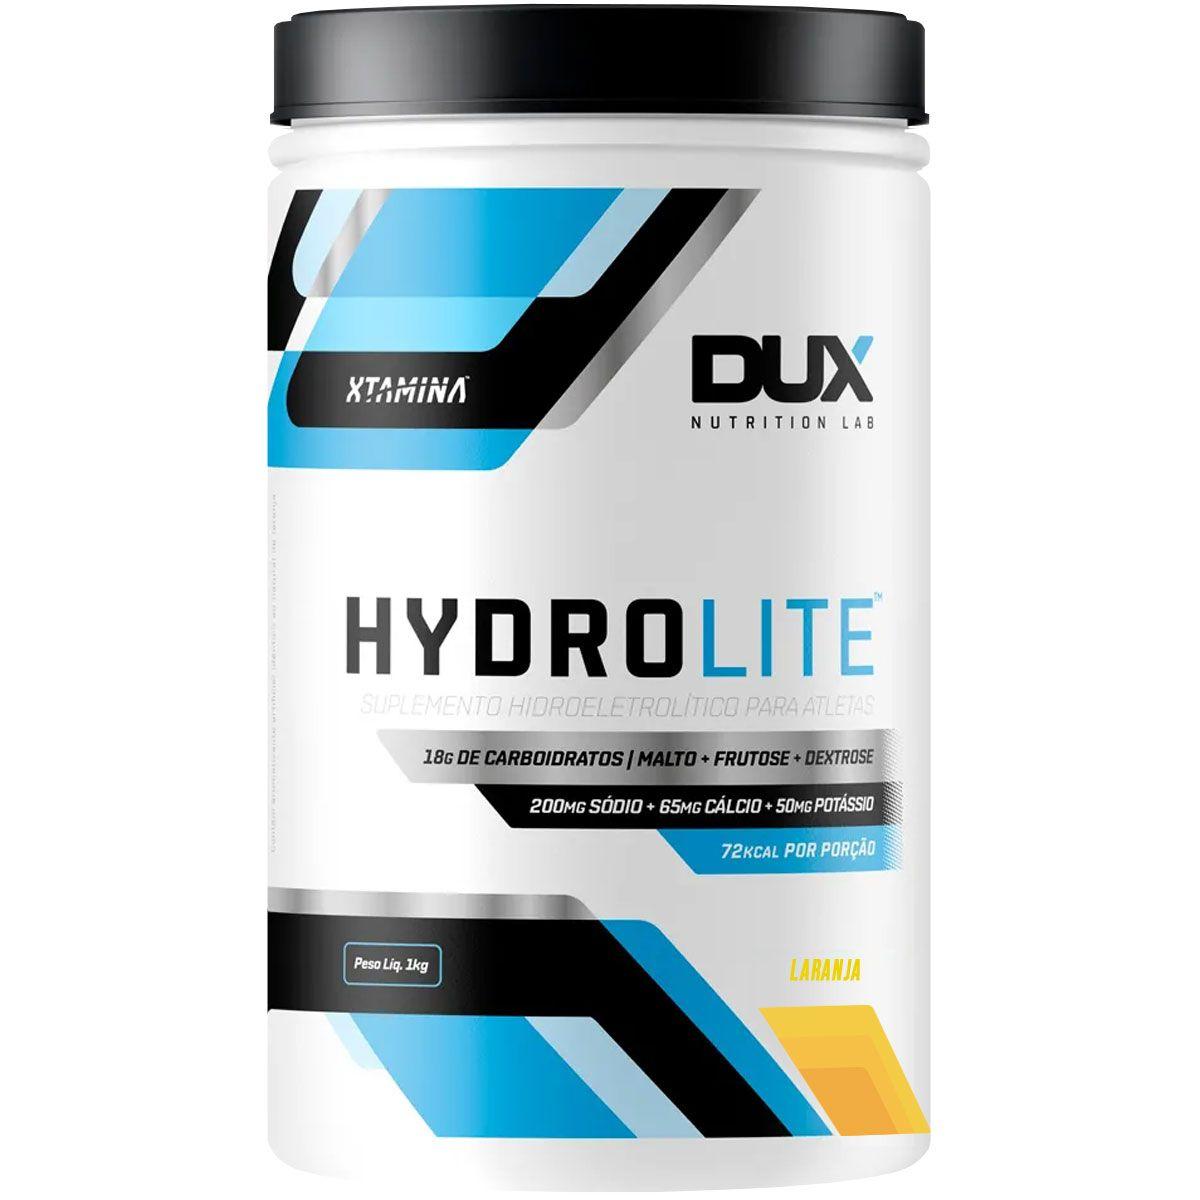 Hydrolite (1kg ) - Dux Nutrition